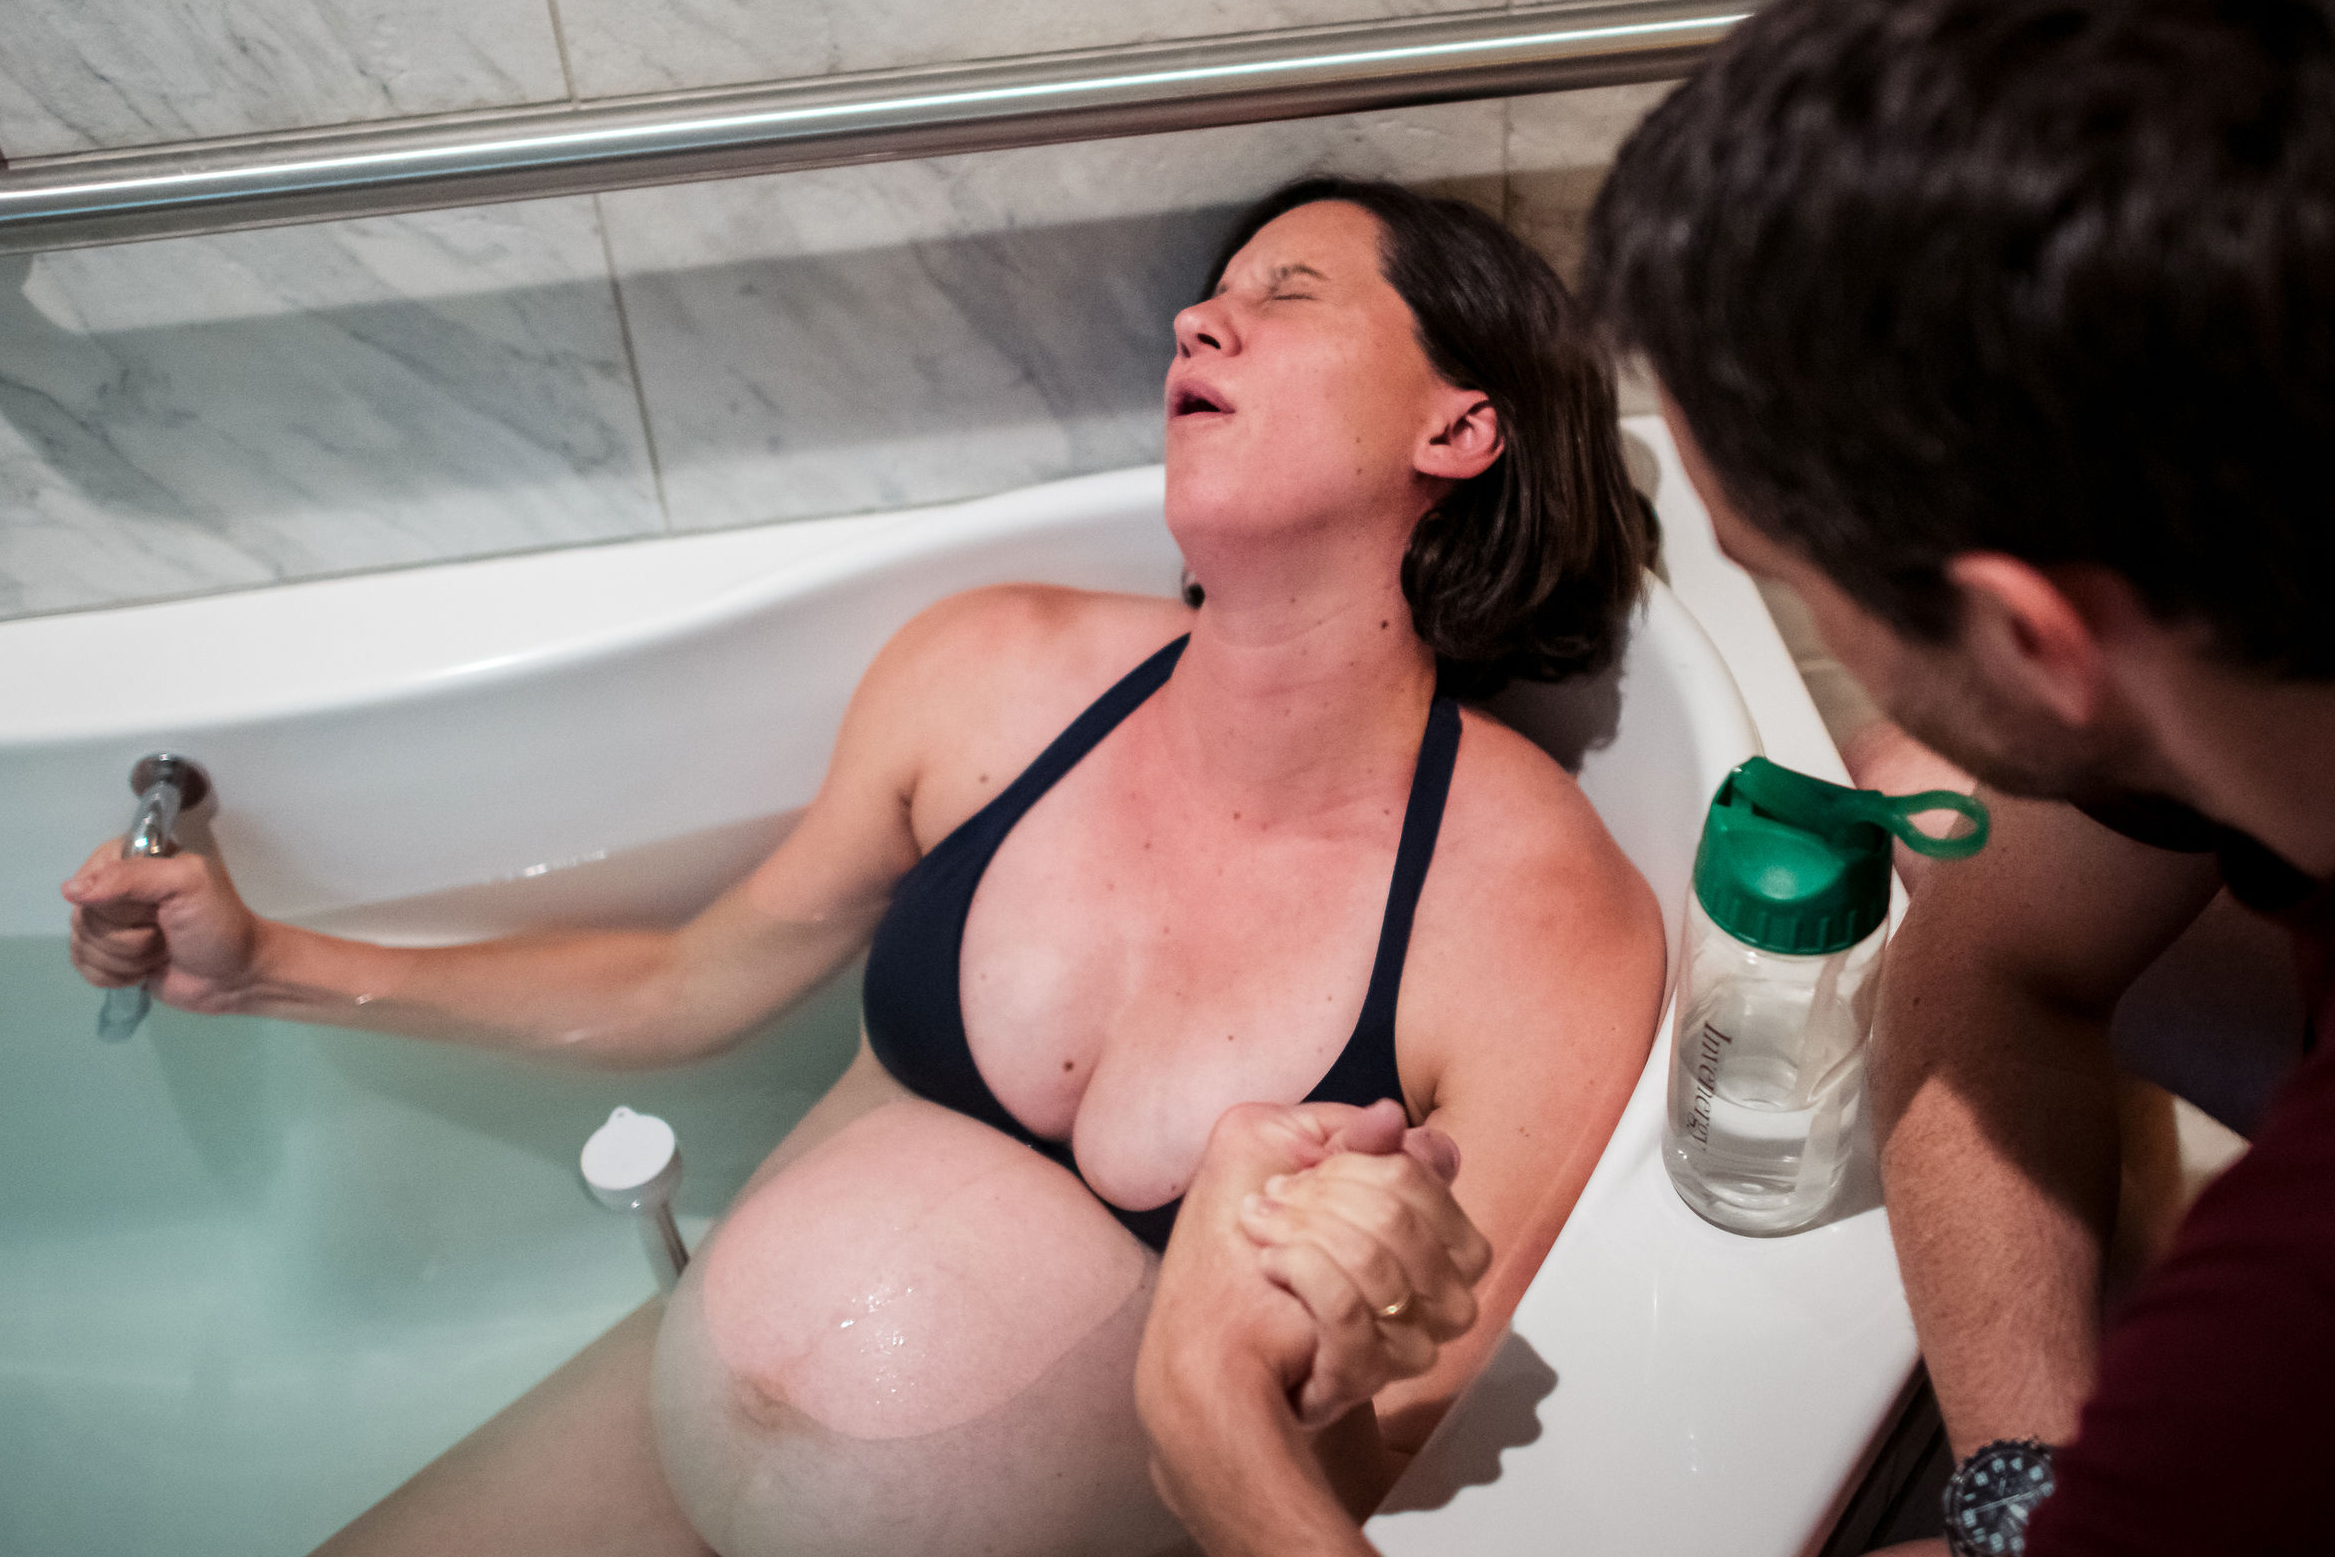 Judd-Birth-Story-2.jpg